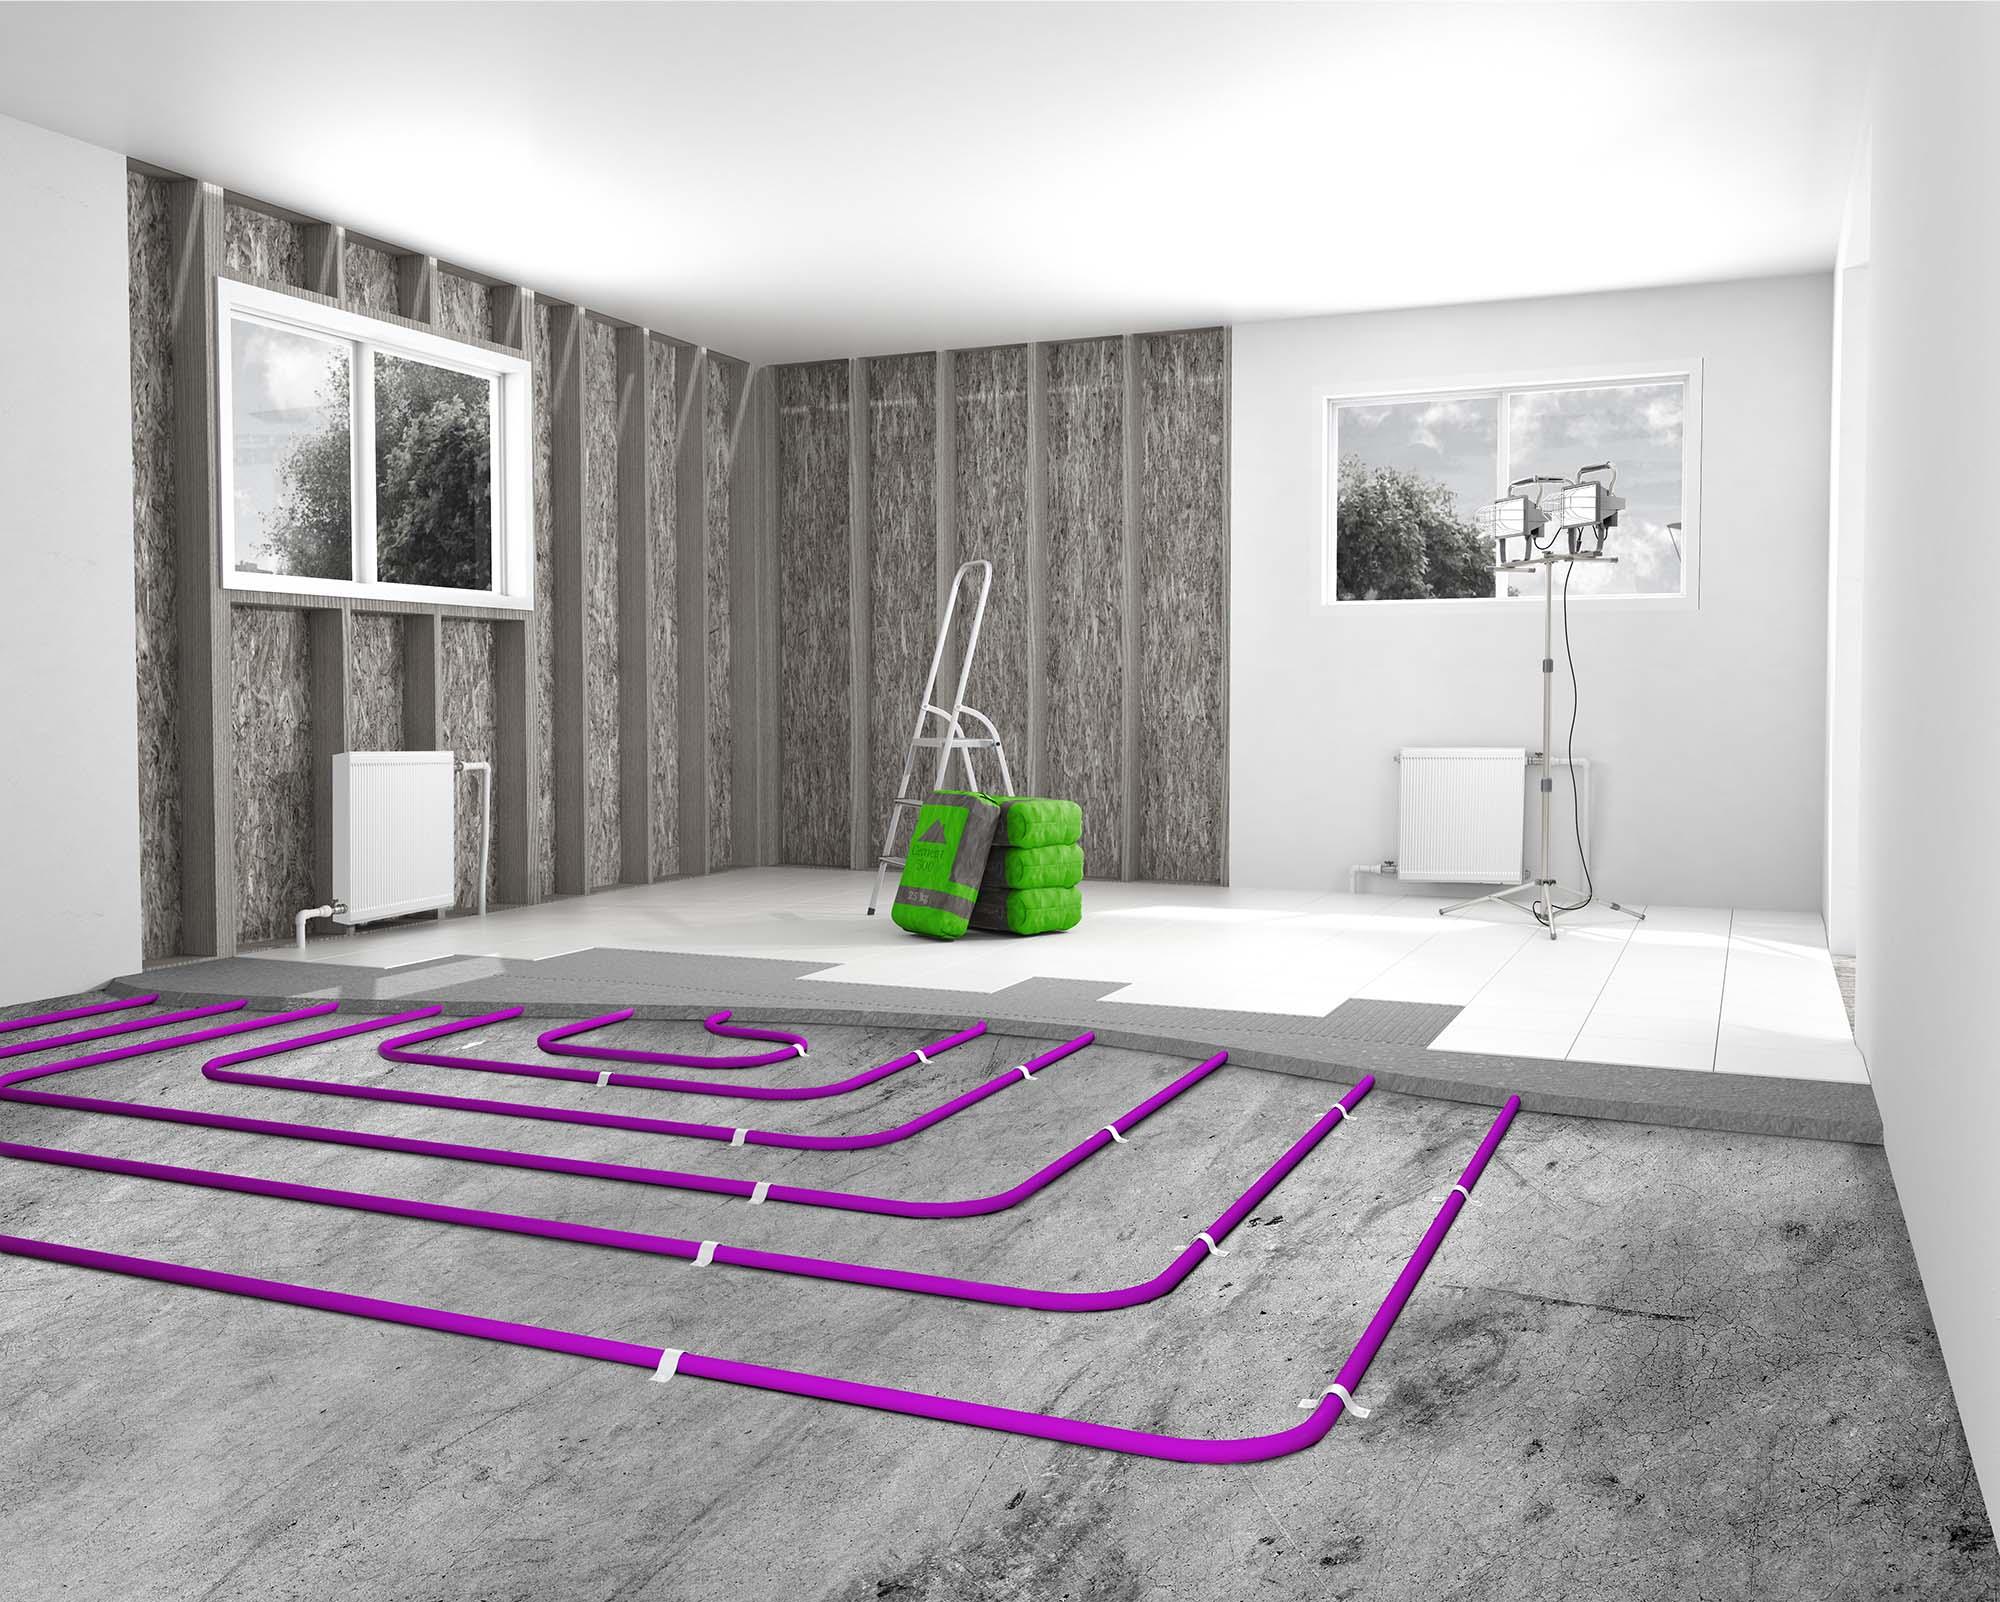 Hydronic Heating Systems - Hydronic Underfloor Heating Sydney | Devex